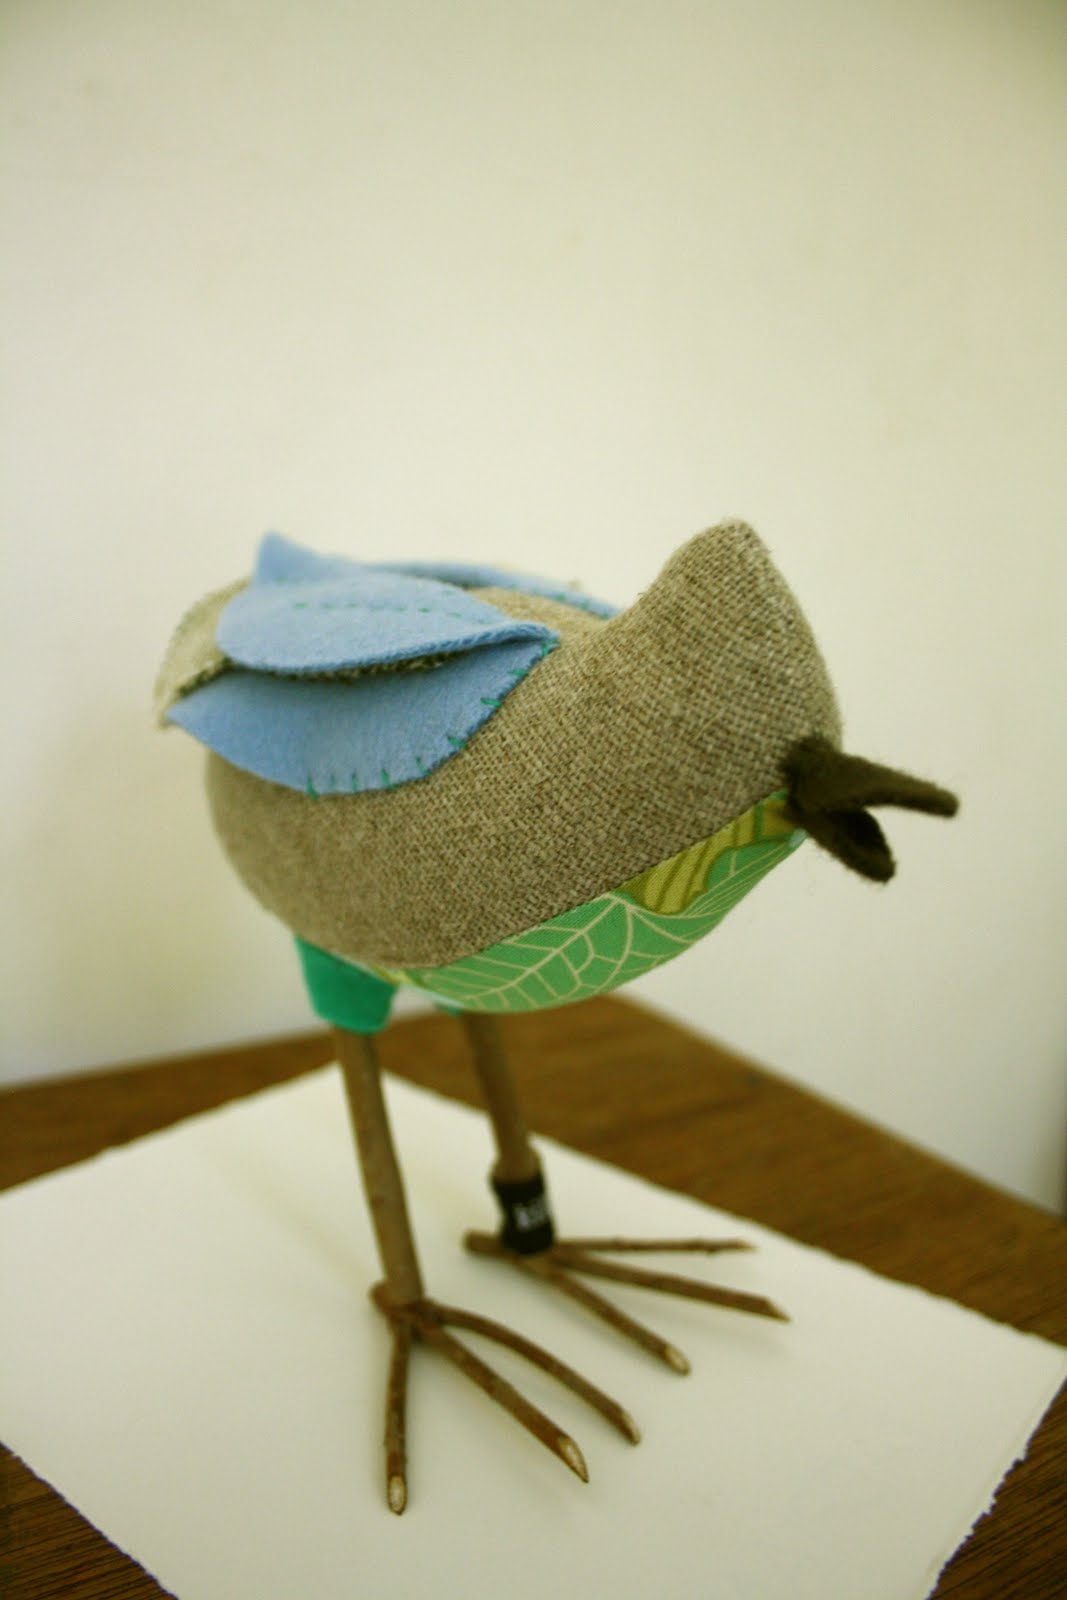 [bluewingpartridge]